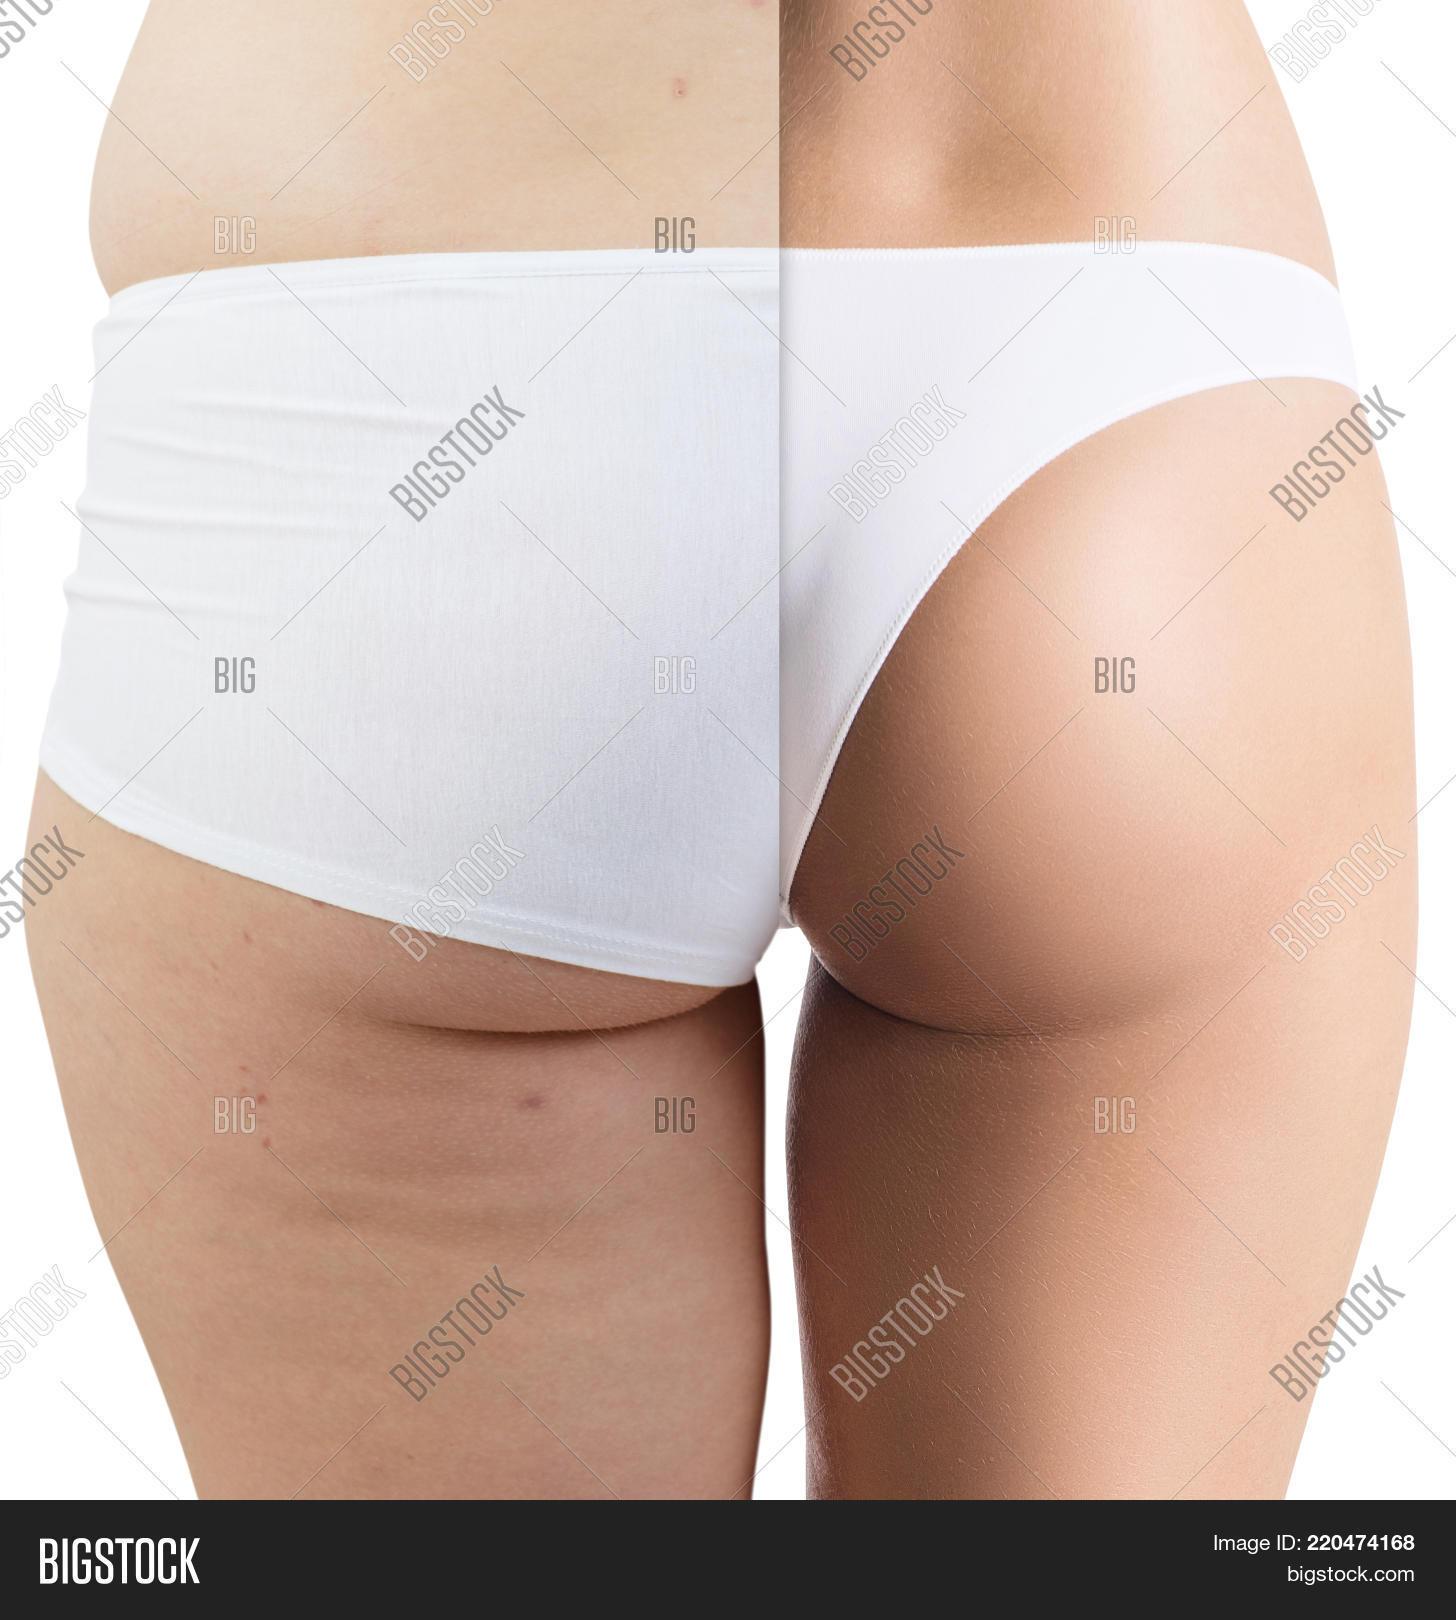 Female Buttocks Before Image Photo Free Trial Bigstock